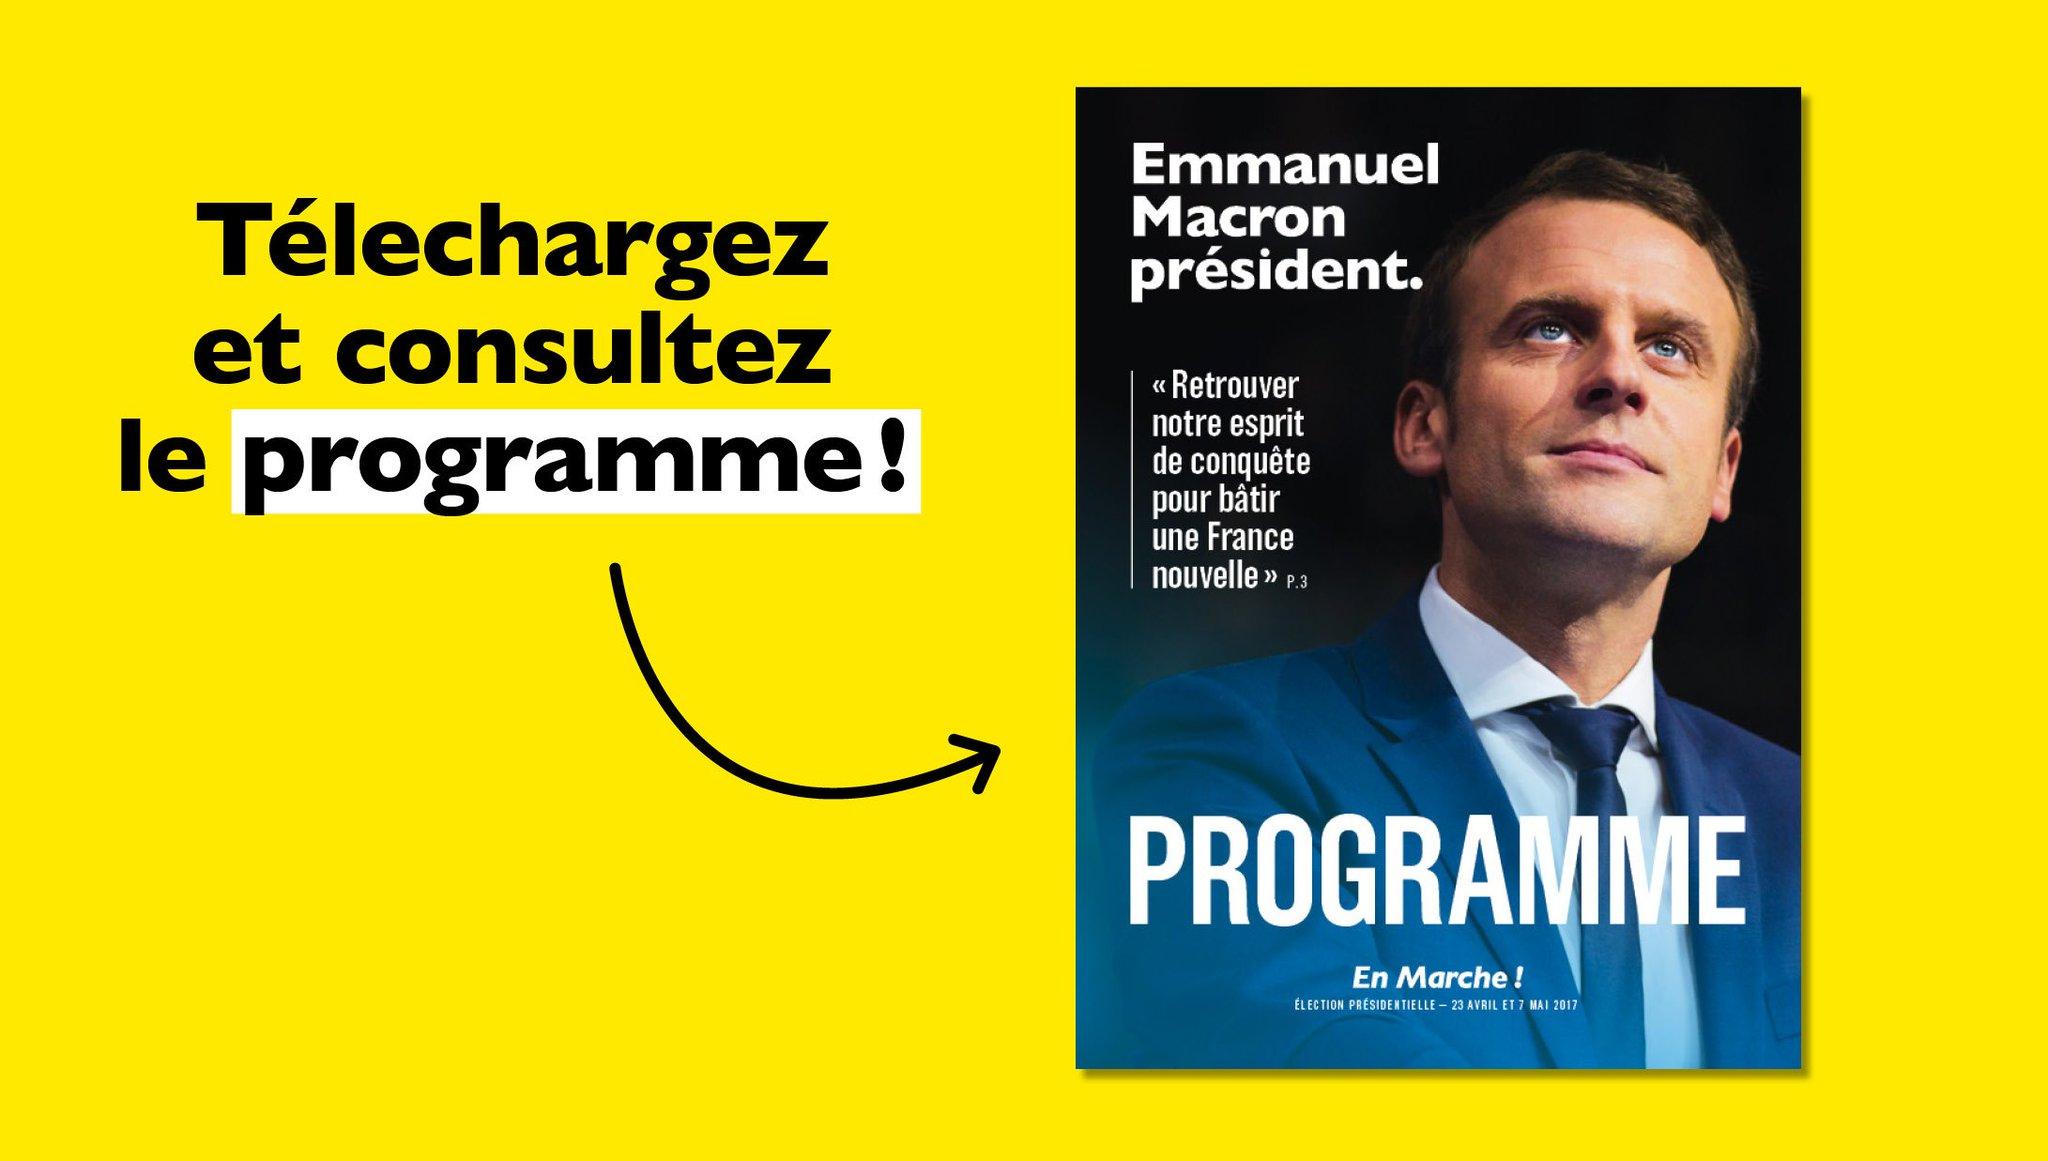 Emmanuel Macron A Twitter Le Programme Que Je Propose Libere Et Protege Rtlmatin Programmeem Https T Co Udky1idyvb